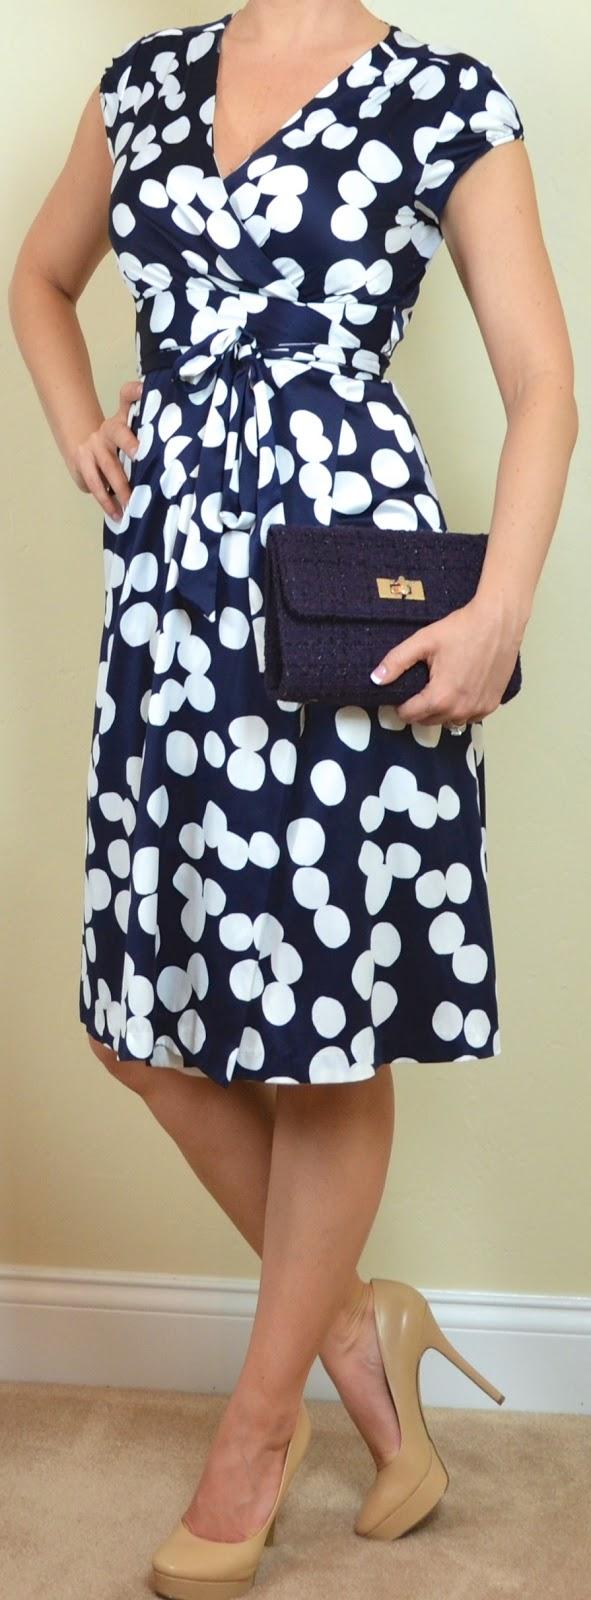 Outfit Post Navy U0026 White Polka Dot Dress Nude Heels ...